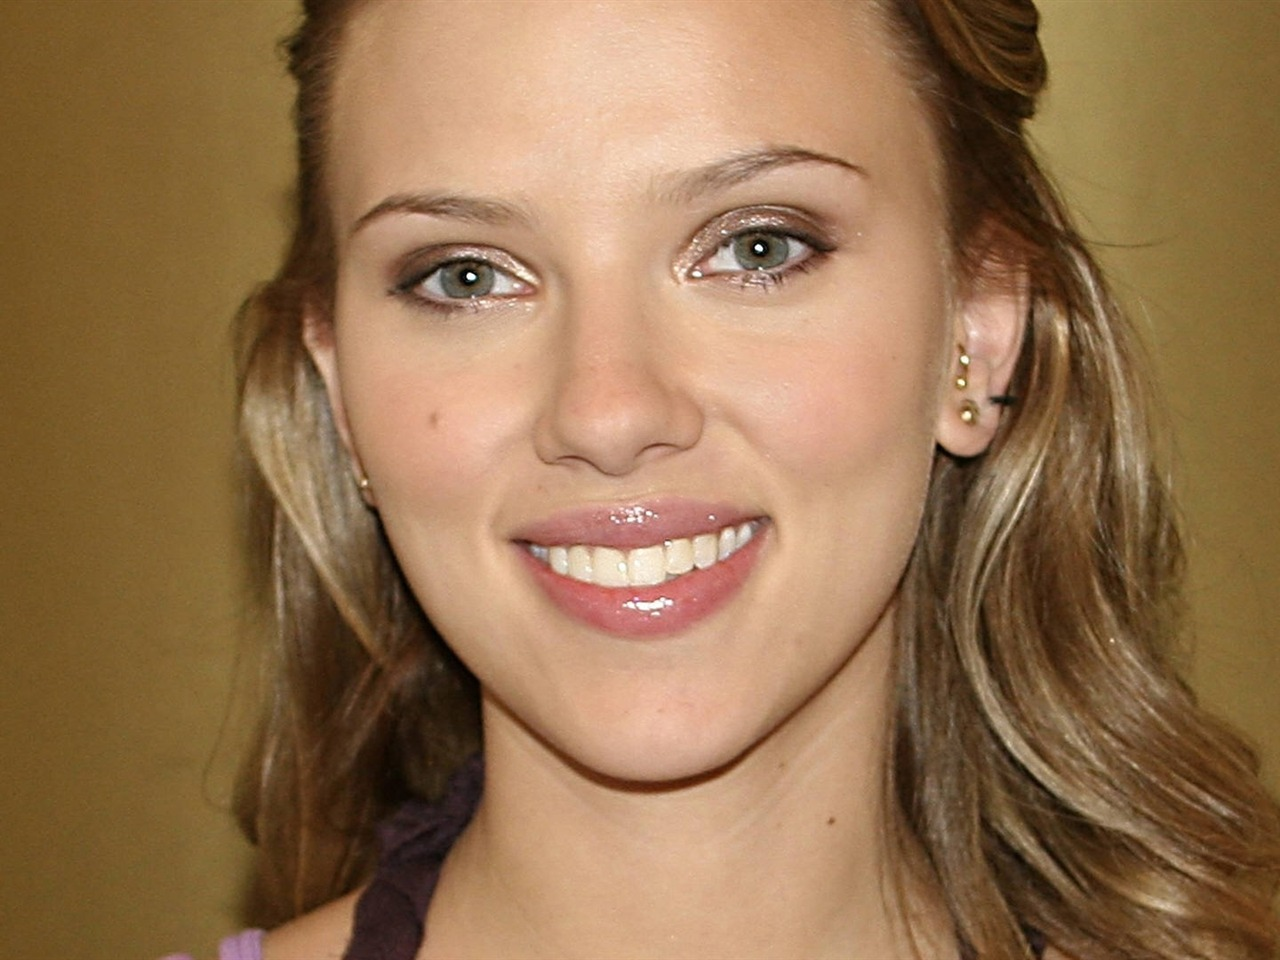 Scarlett_Johansson-Pure_beauty_desktop_wallpaper_album_1280x960.jpg Scarlett Johansson